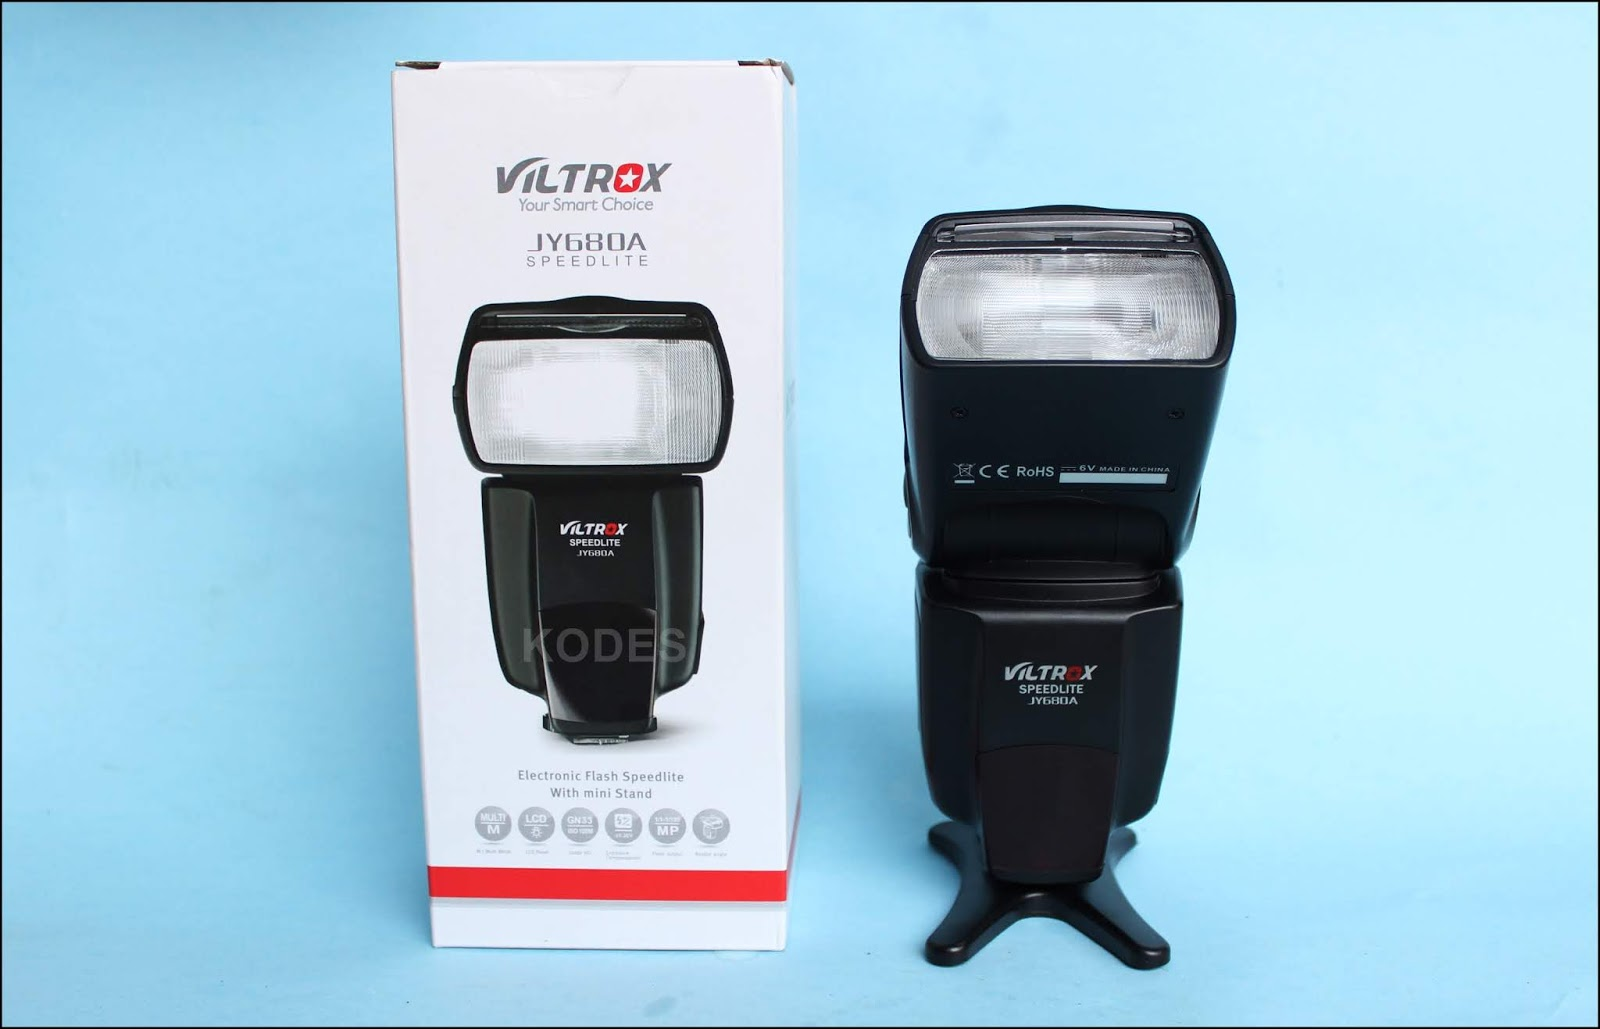 Viltrox JY680A, Flash Eksternal Murah Berkualitas